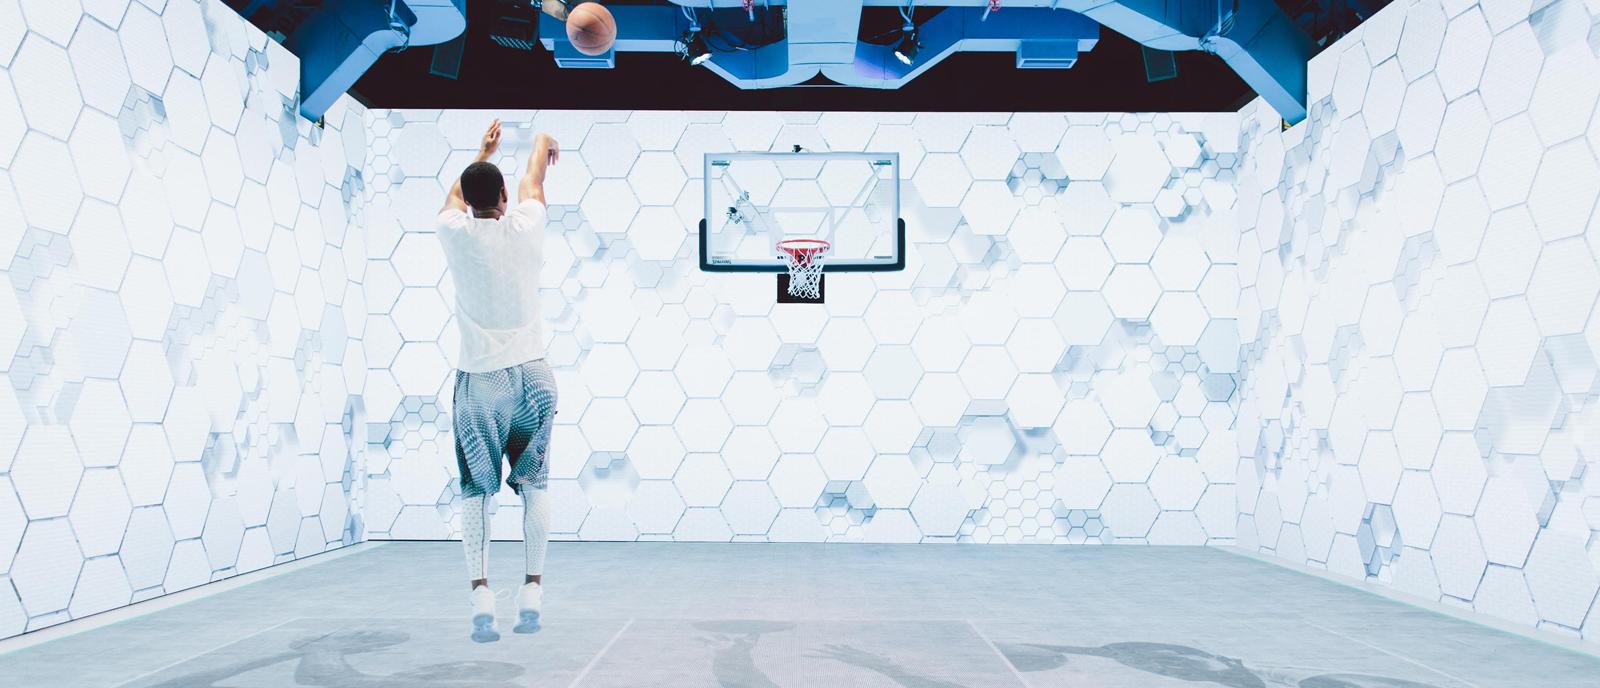 Jordan Brand's Pearl Pavilion: Last Shot Experience